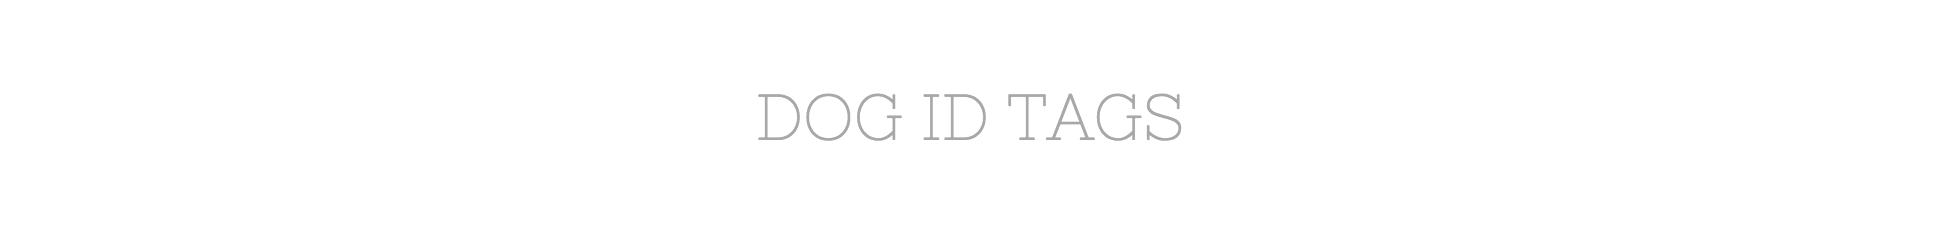 Dog ID Tags| Designer and Custom Dog ID Tags | Custom Dog Tags for Dogs | Designer Dog Tags for Dogs | Dog Tags For Dogs